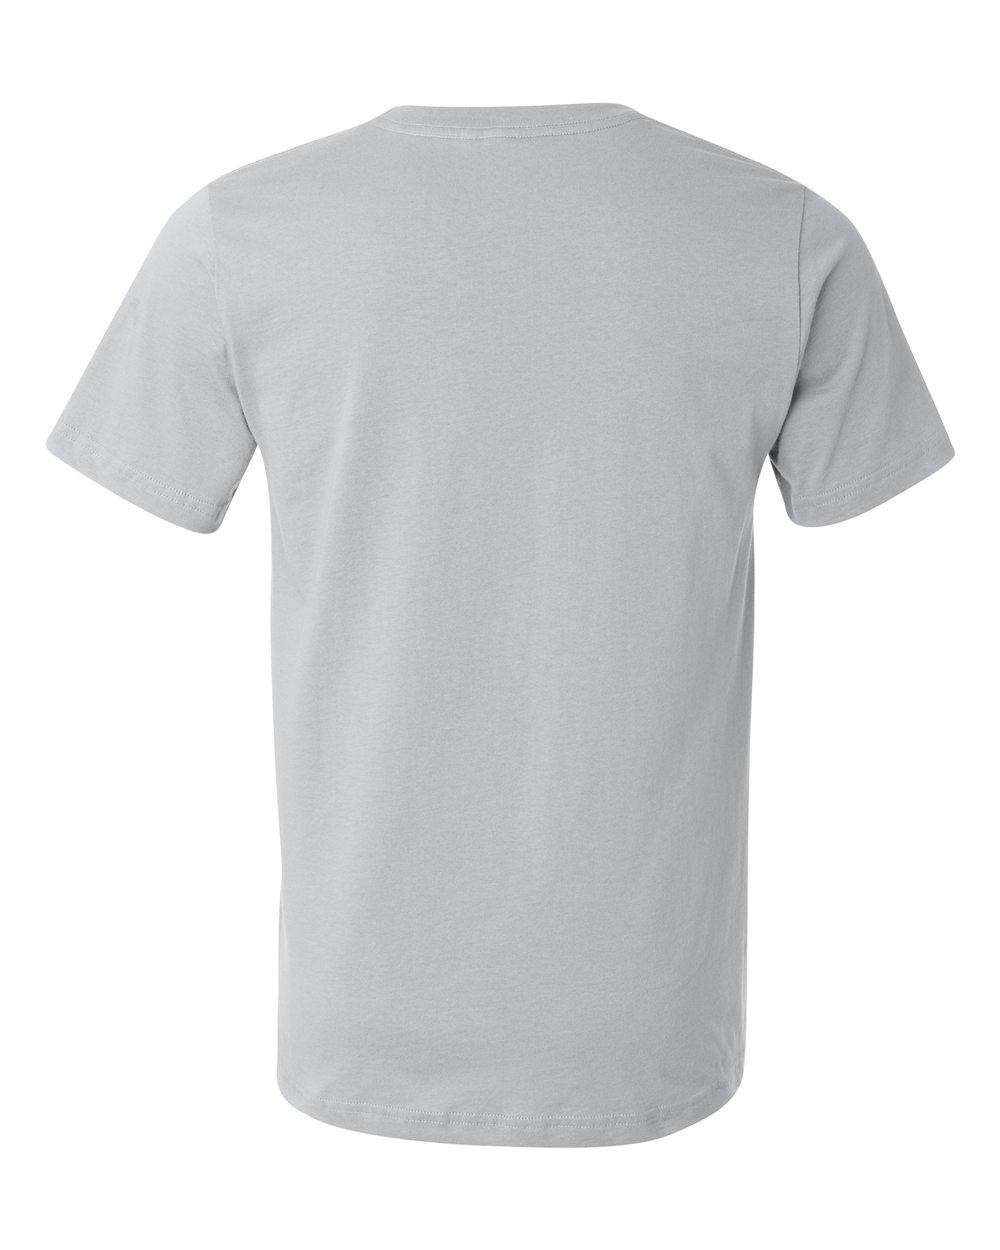 Bella-Canvas-Unisex-Made-in-USA-Jersey-Short-Sleeve-T-Shirt-3001U-XS-3XL thumbnail 34